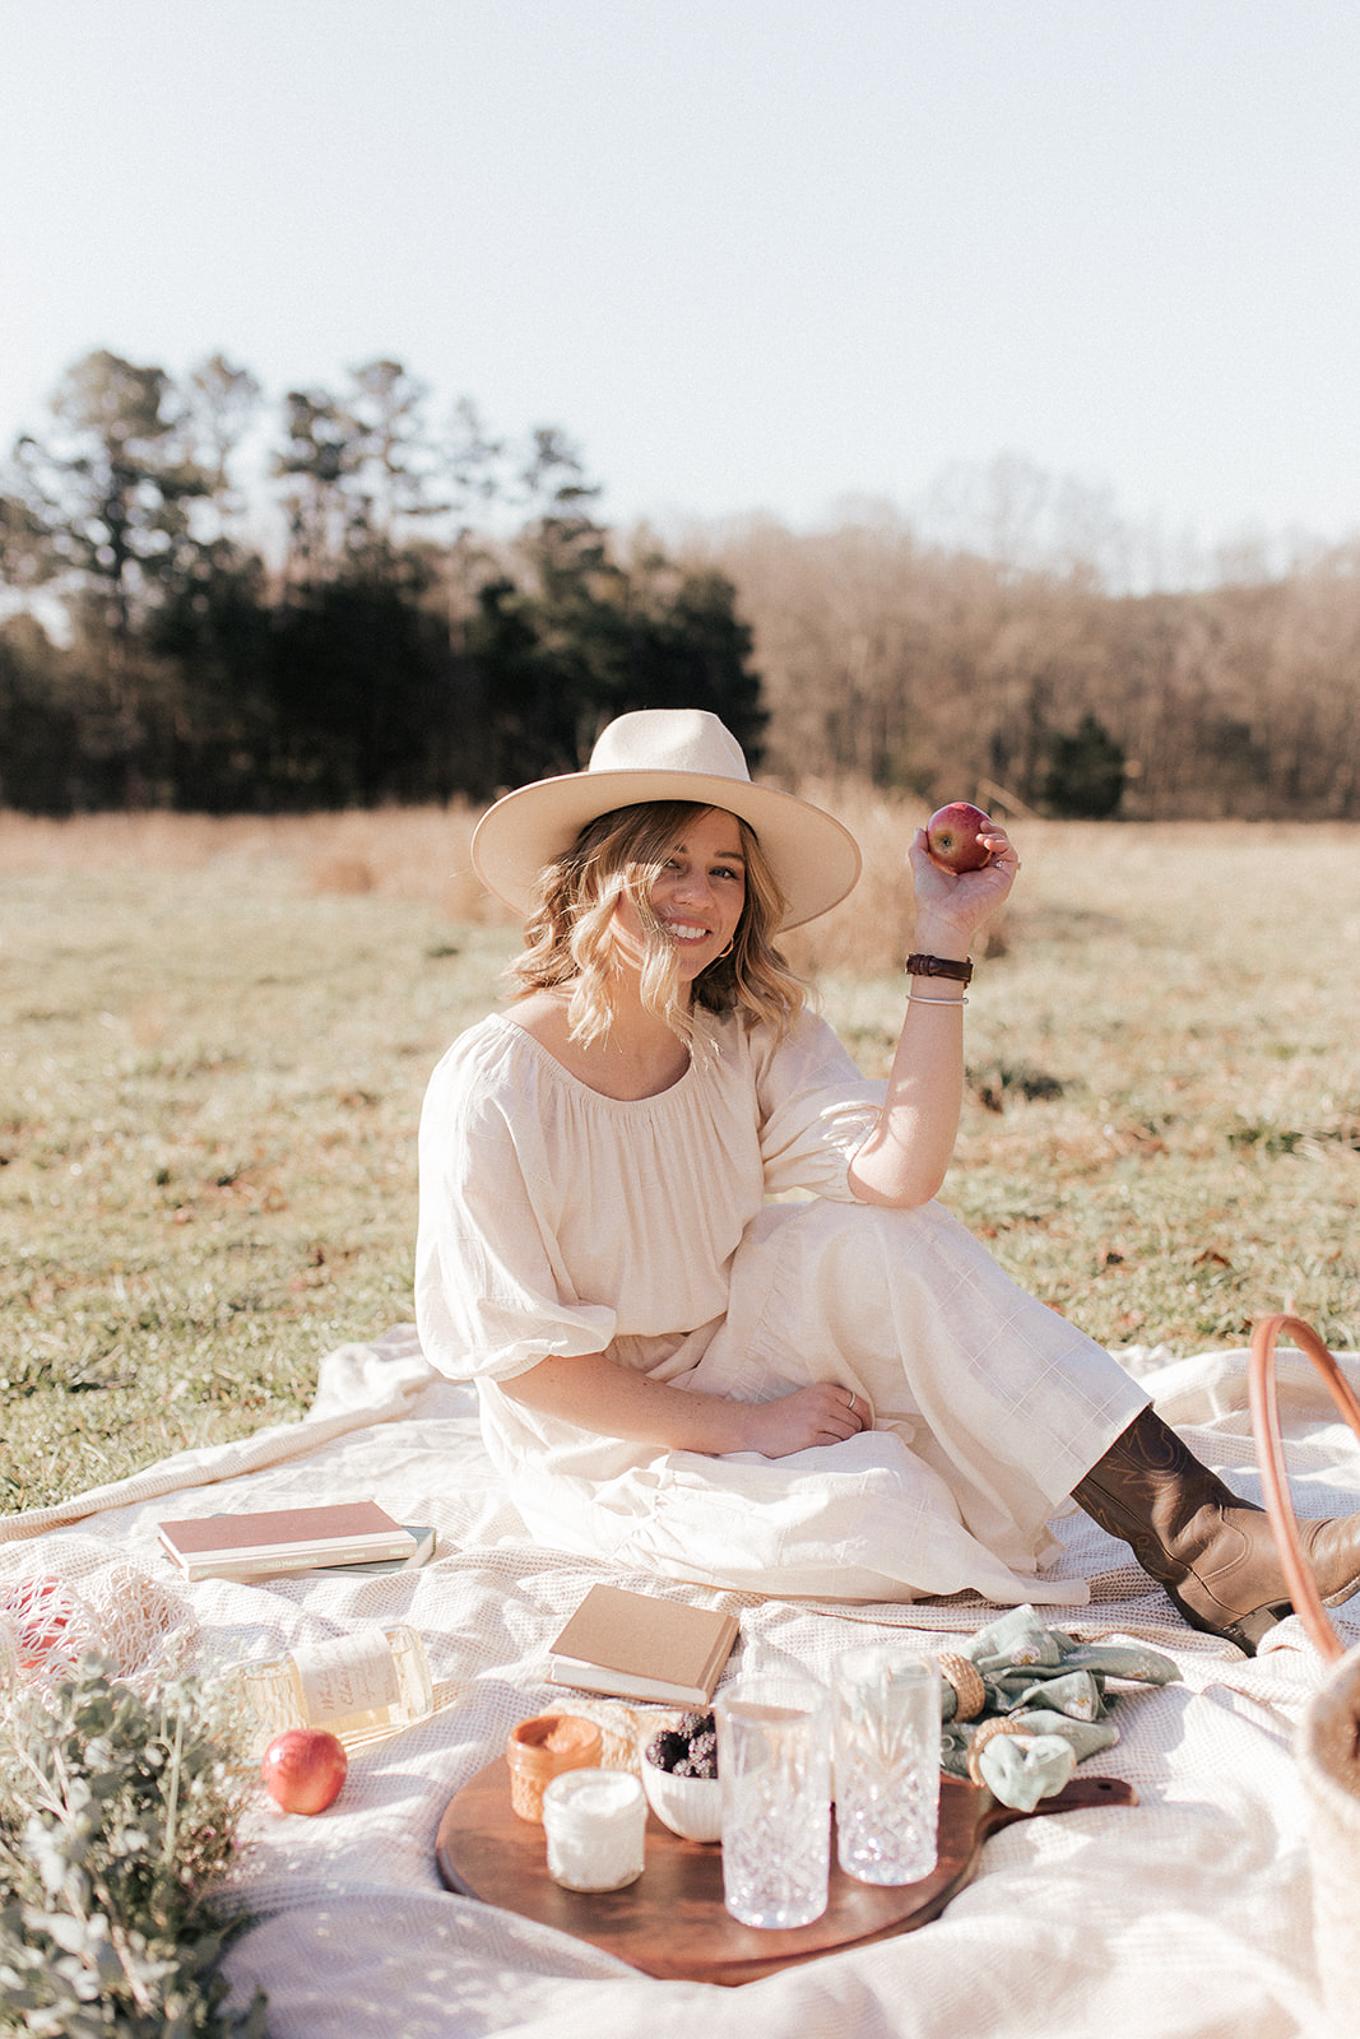 Summer Picnic Supplies & Simple Menu | Louella Reese